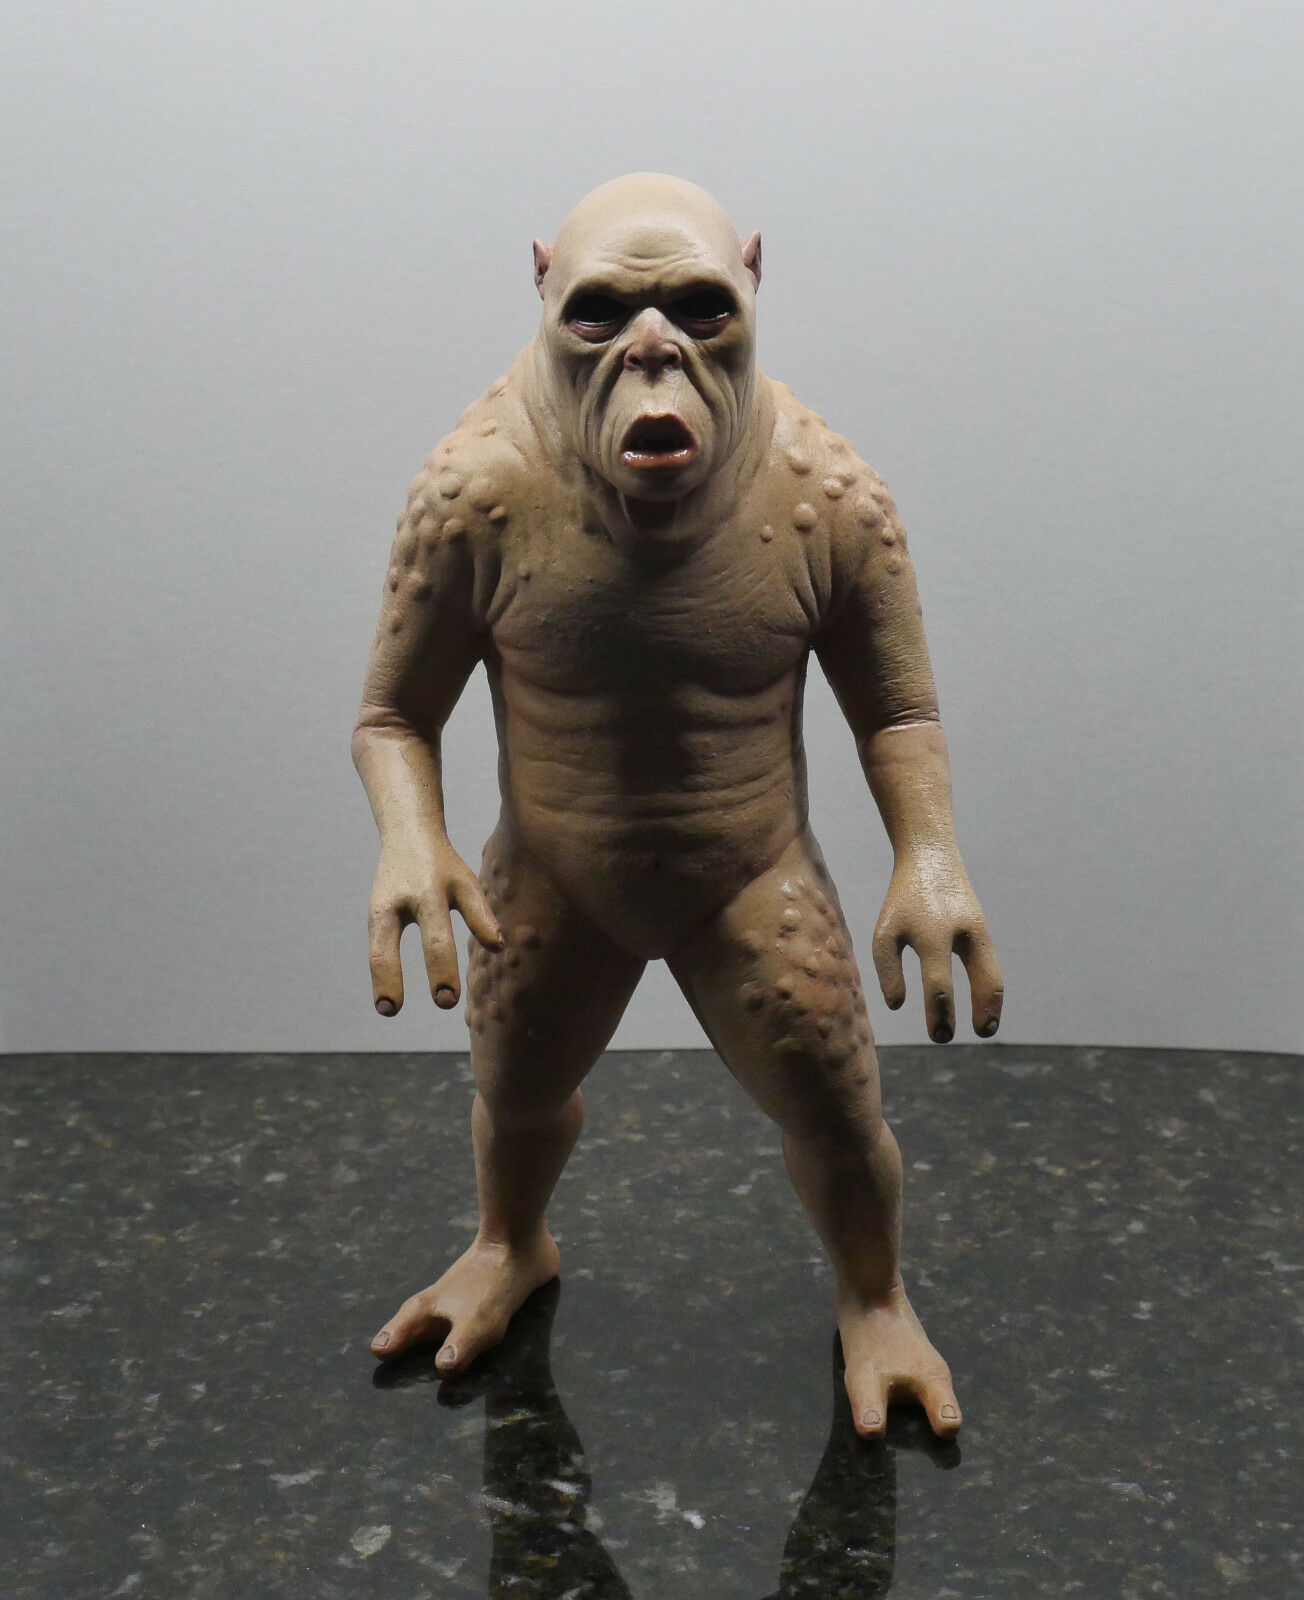 The Gate Minion Demon 1:1 Scale Creature Horror Movie Prop Replica Figure Toy